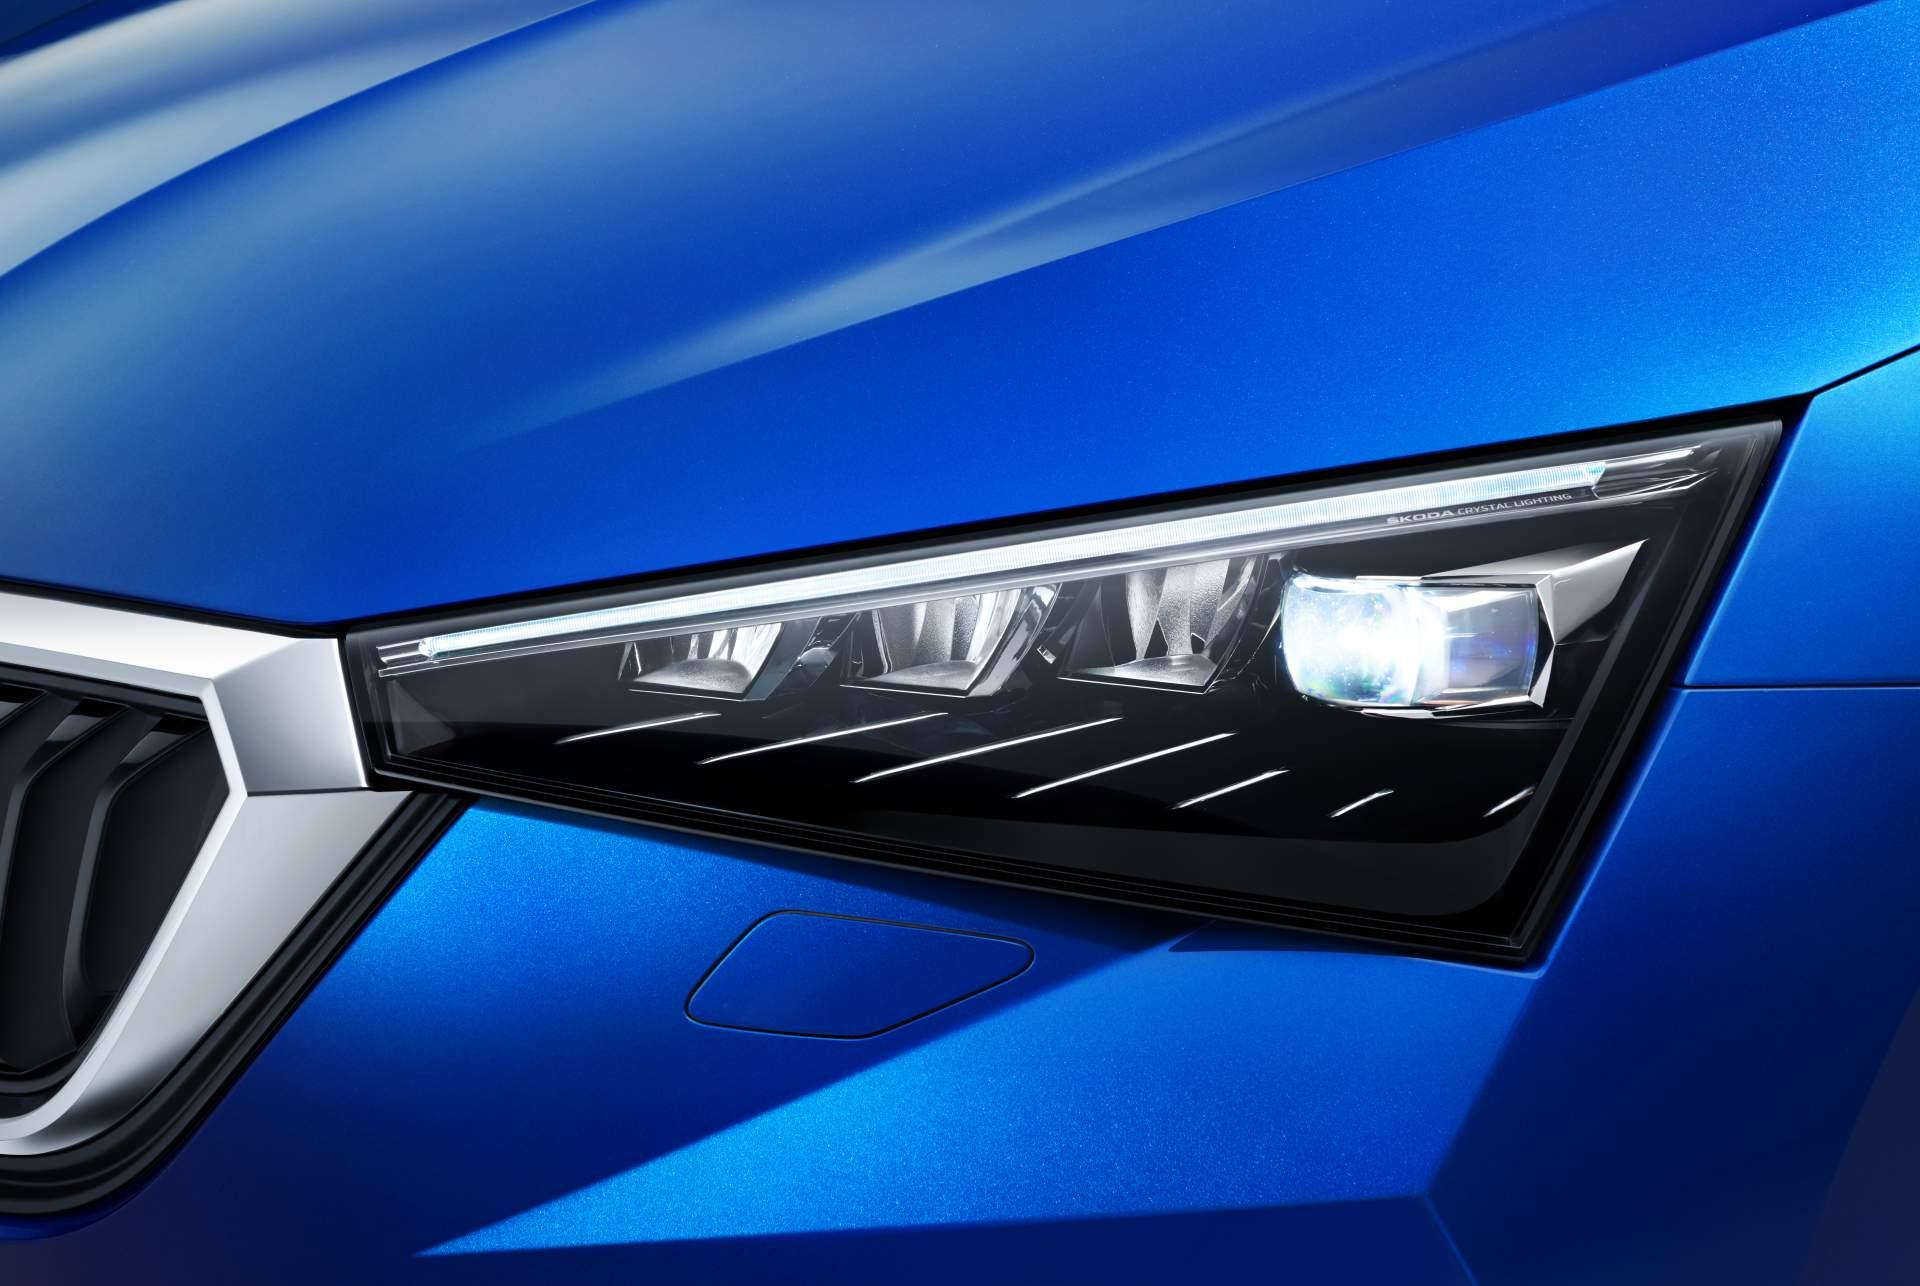 Imaginile care fac Volkswagen sa tremure de frica. Cum arata noua Skoda Scala, masina care concureaza cu Golf